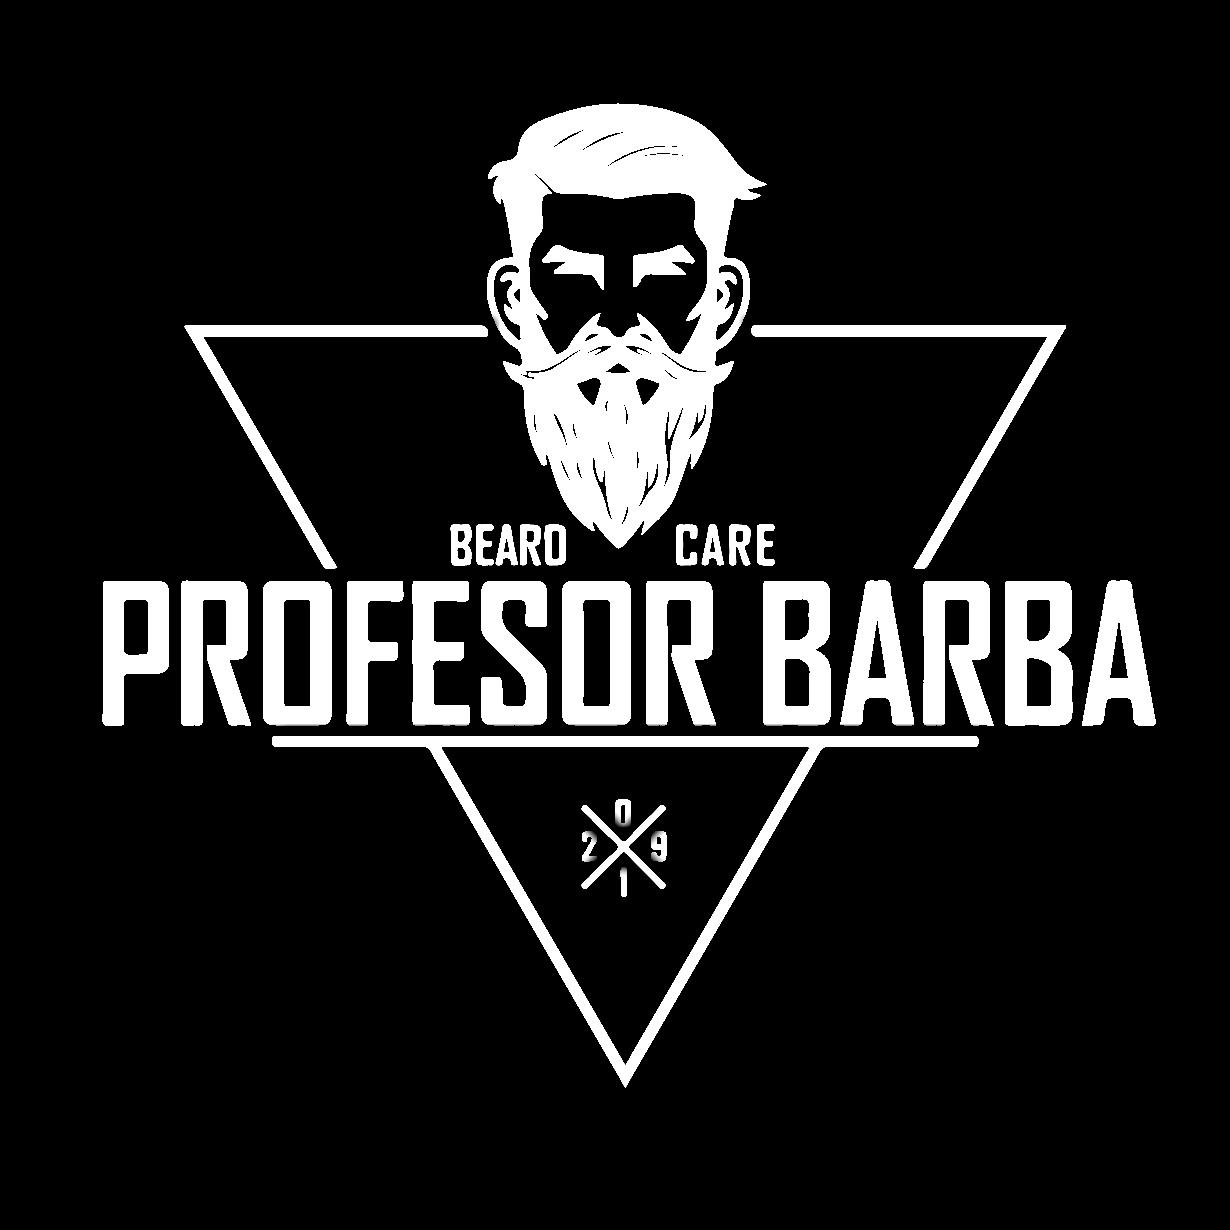 Profesor-Barba